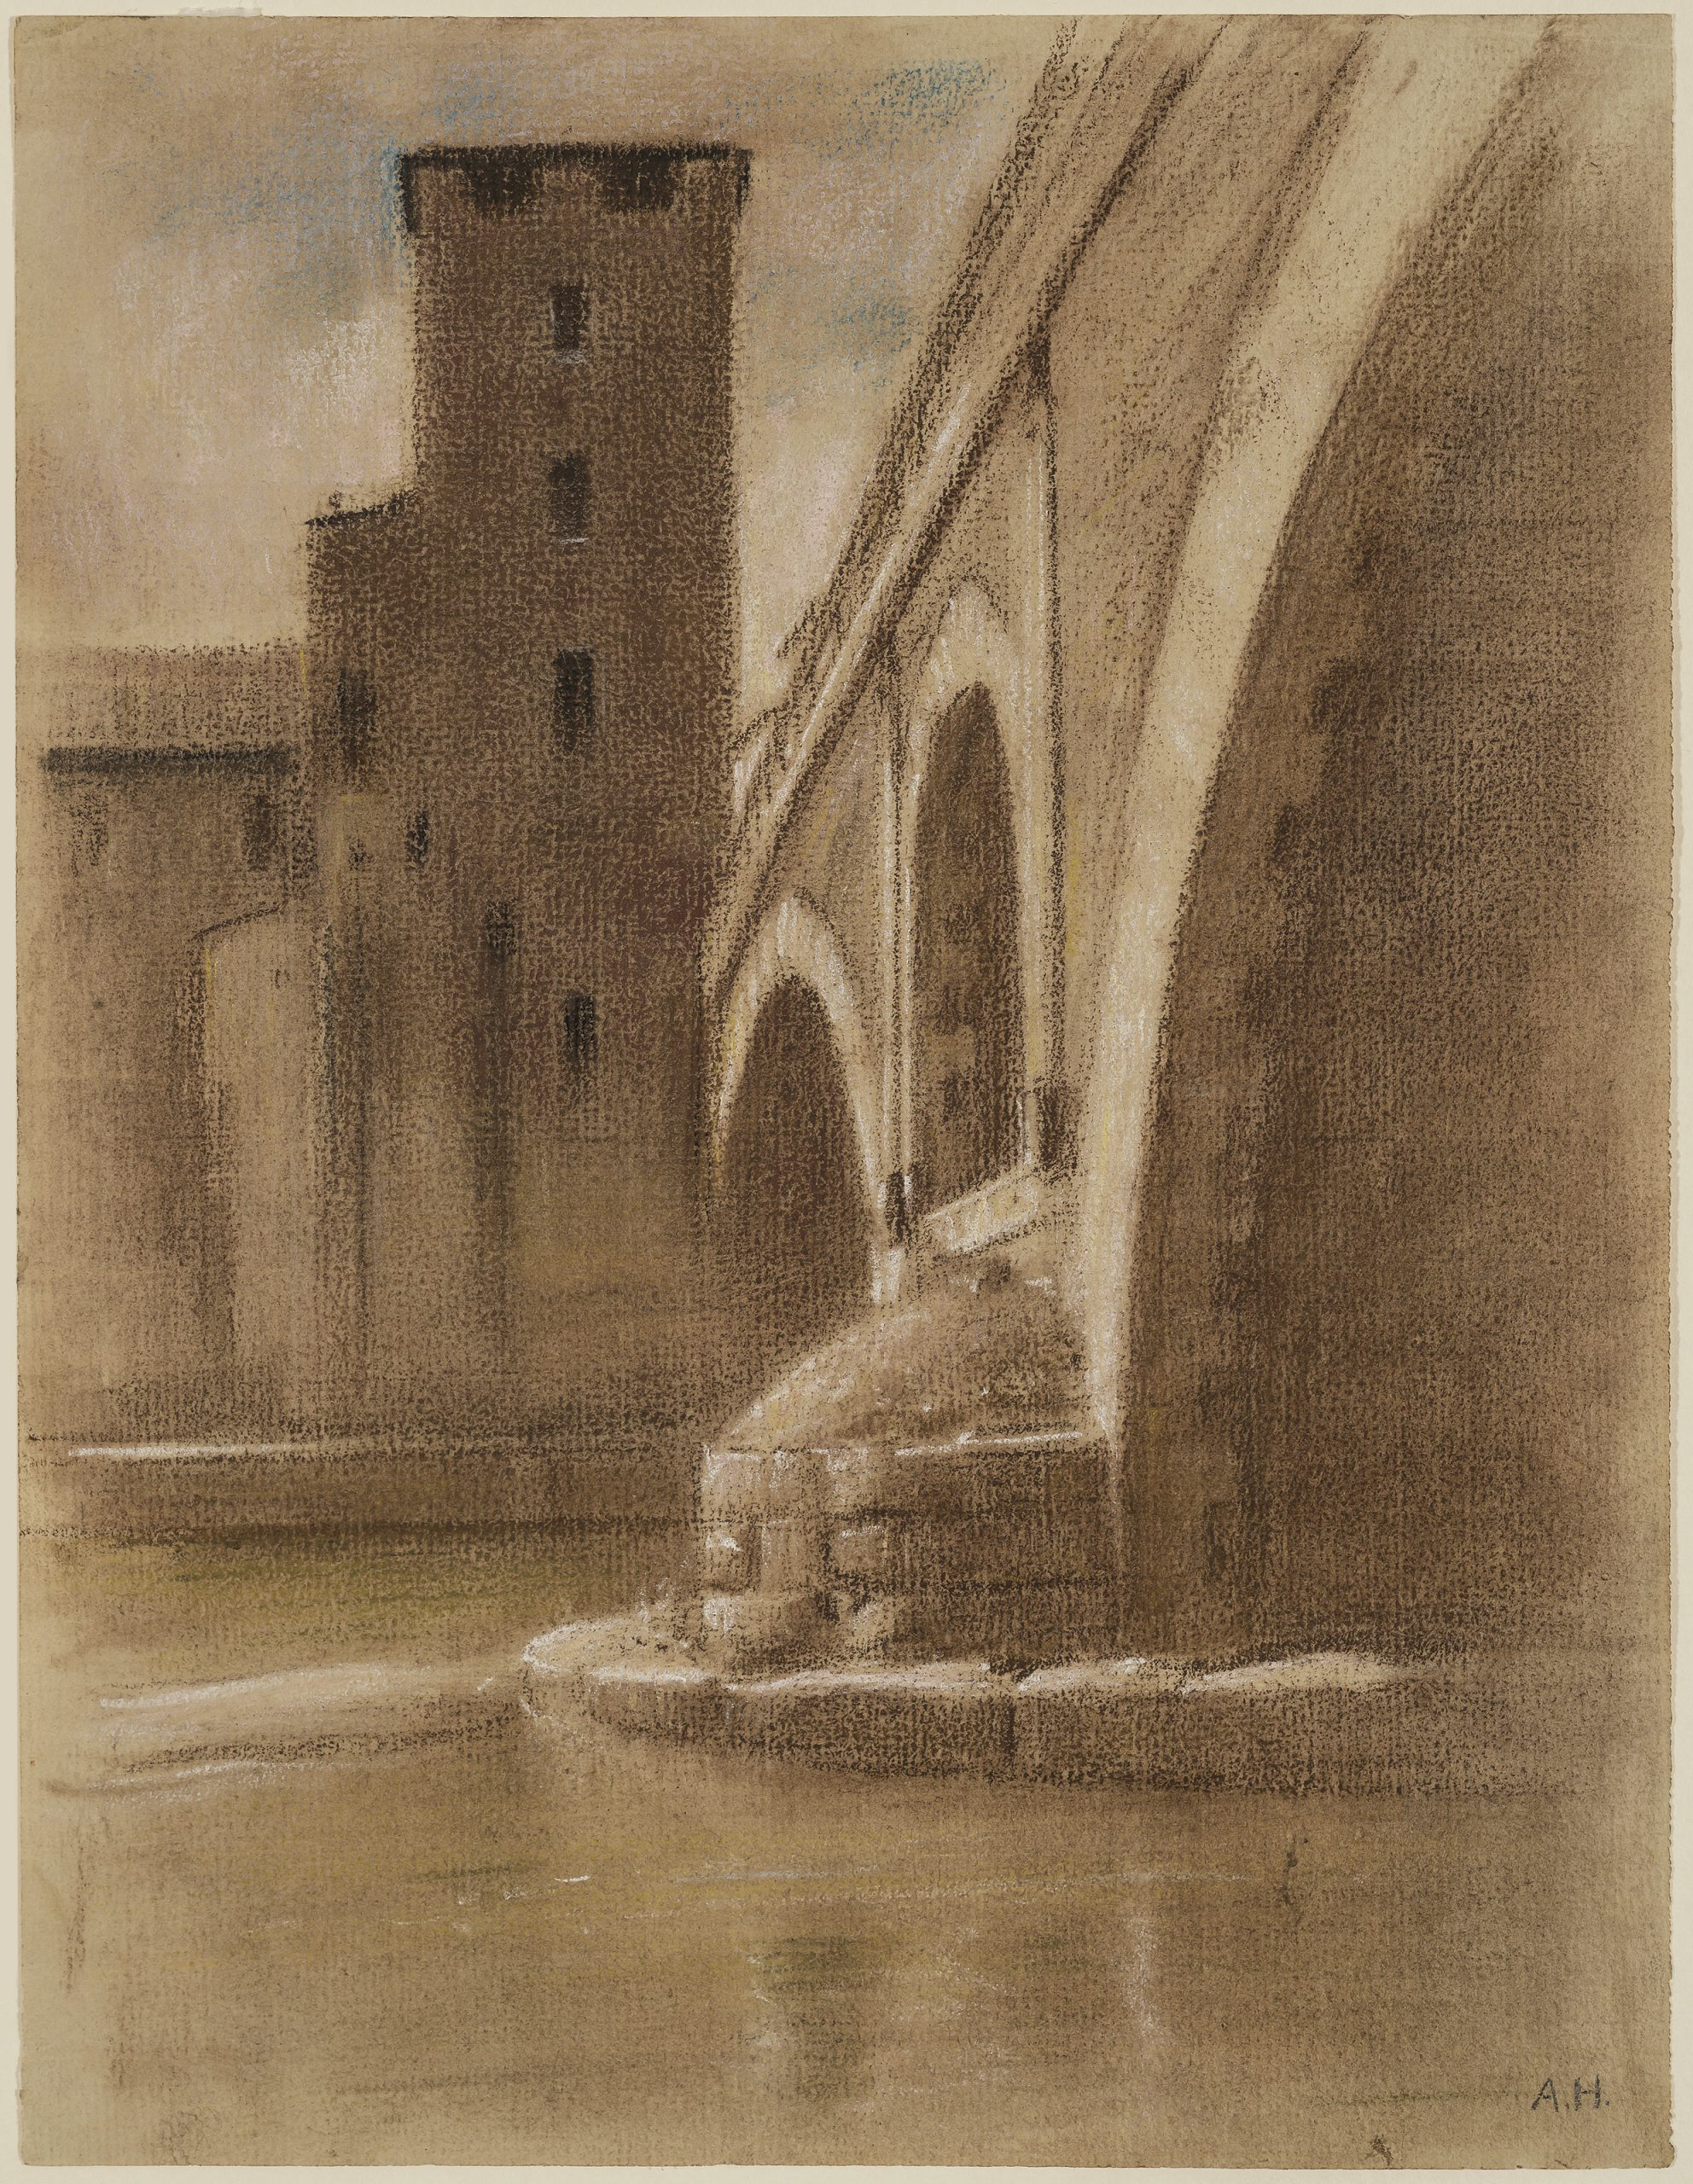 The Ponte dei Quattro Capi in Rome by Adolf Hiremy-Hirschl